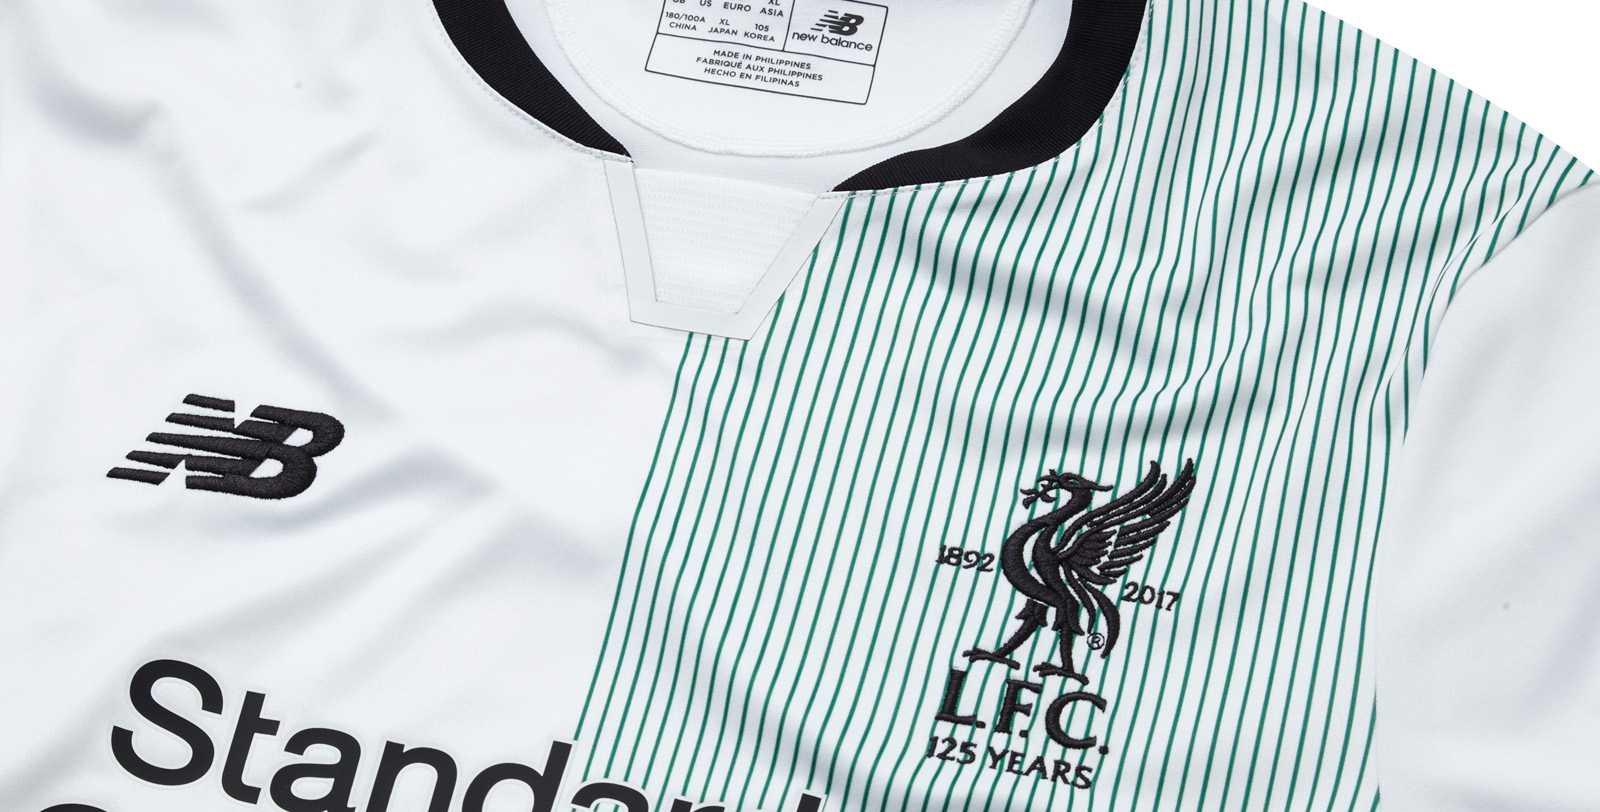 Liverpool away kit details